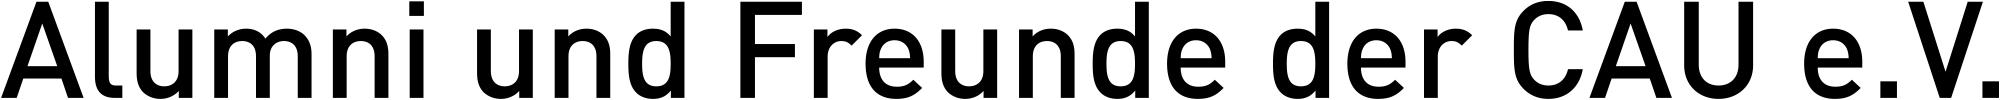 Alumni-Verein